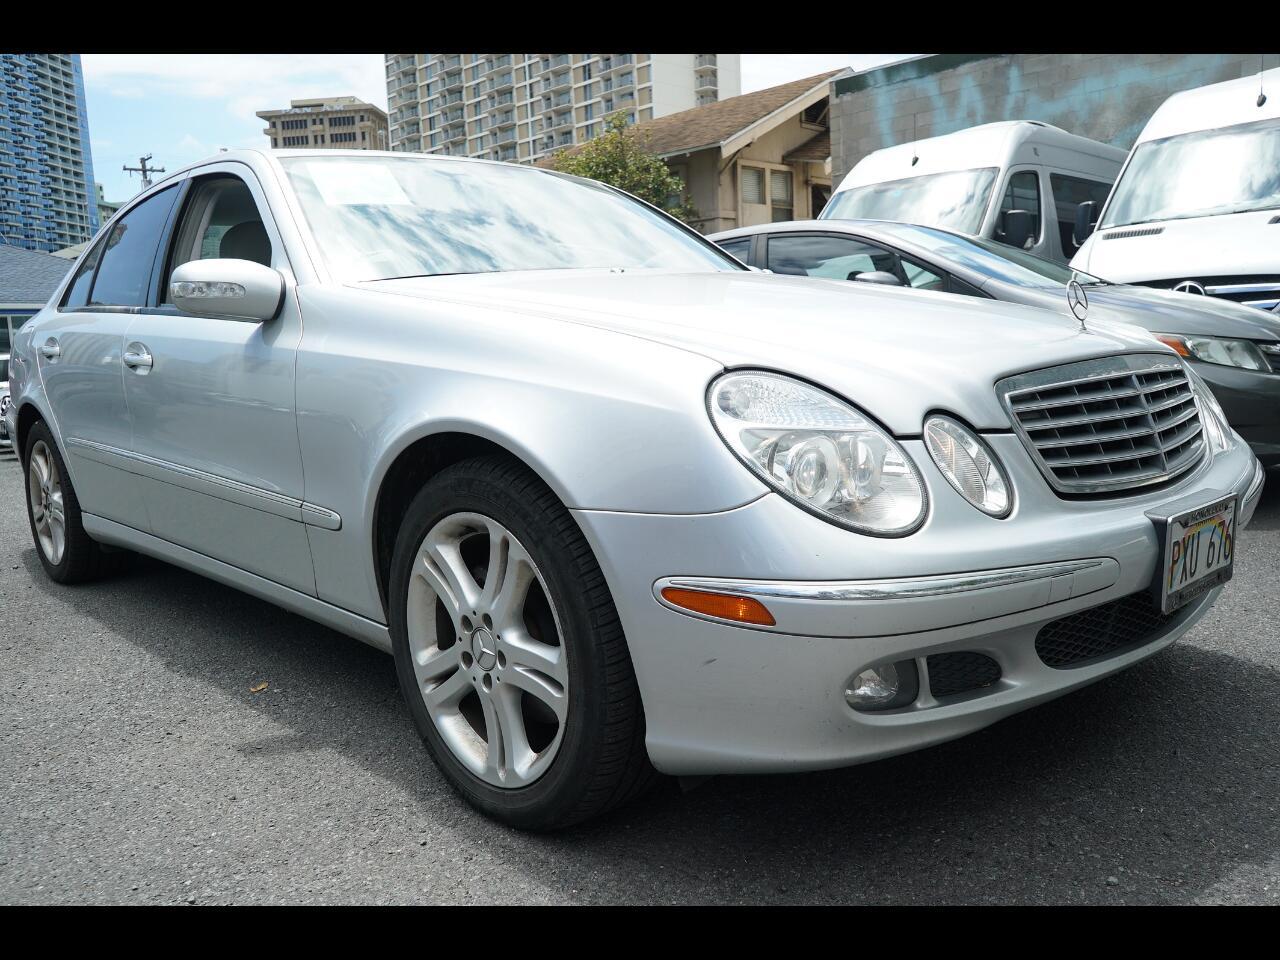 2006 Mercedes-Benz E-Class 4dr Sdn 3.5L